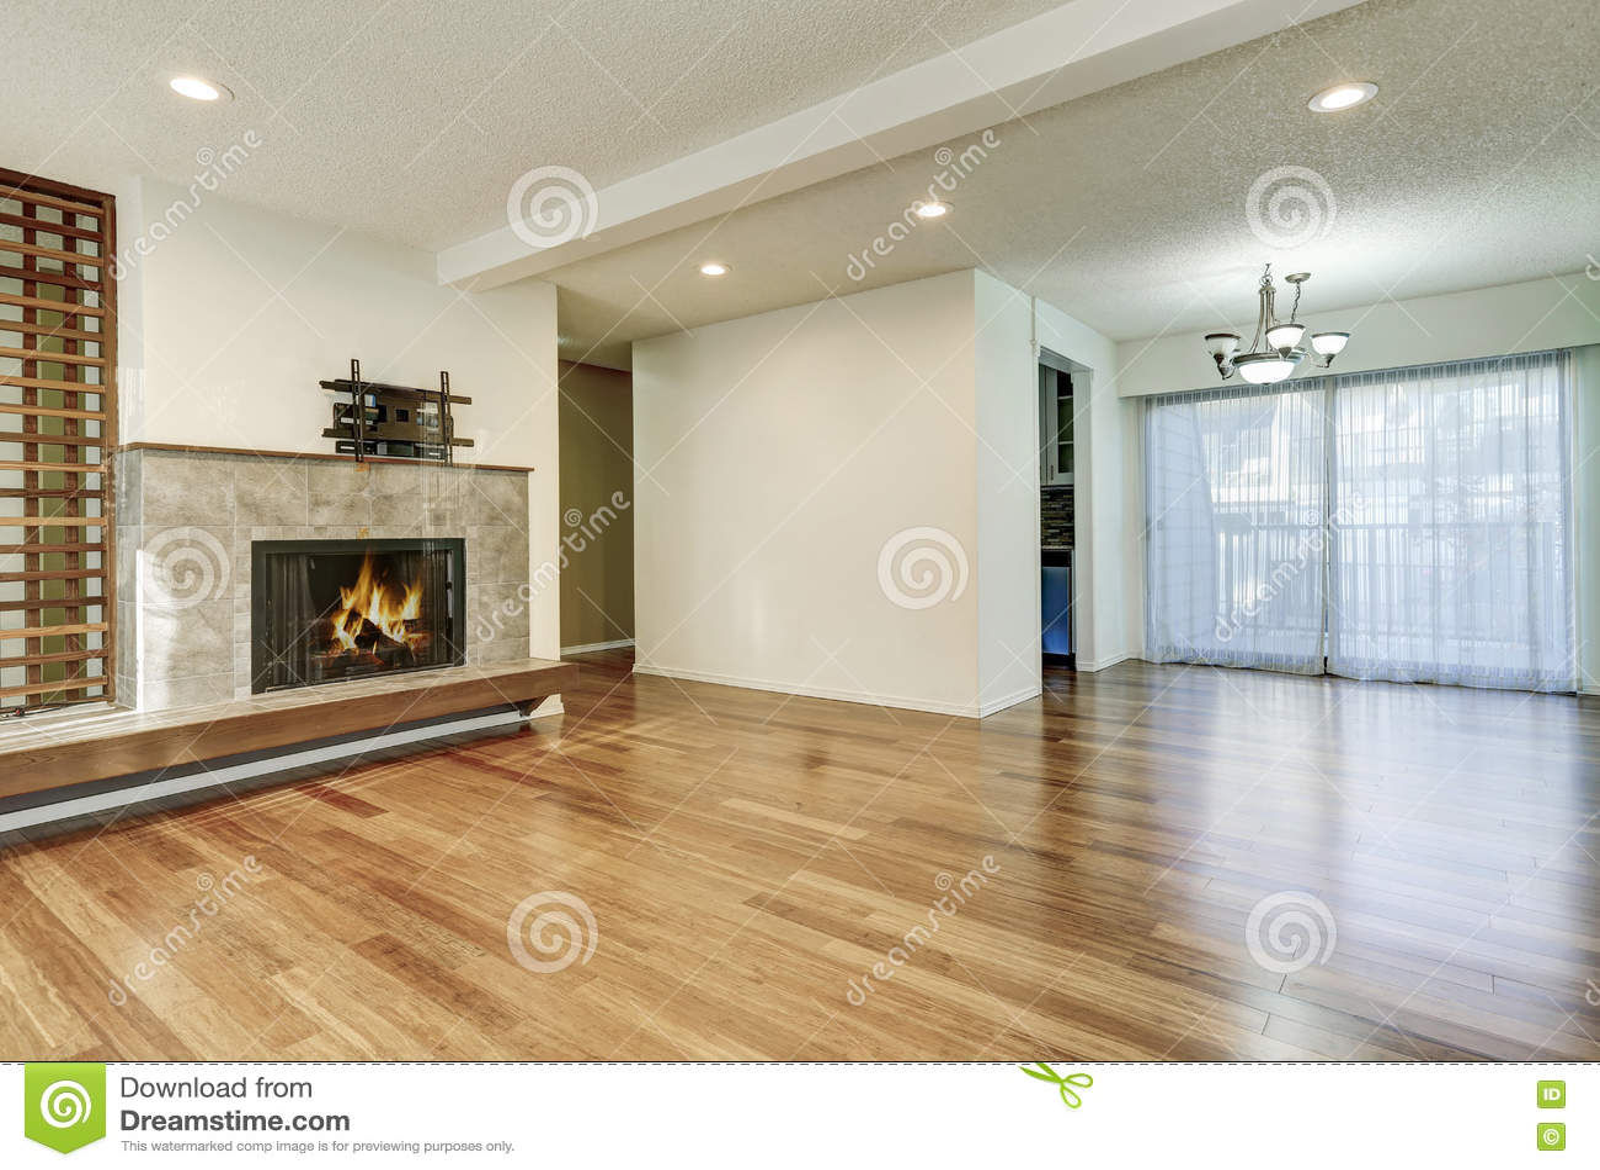 wonderful empty apartment living room | Apartment Empty Living Room Interior Stock Image - Image ...